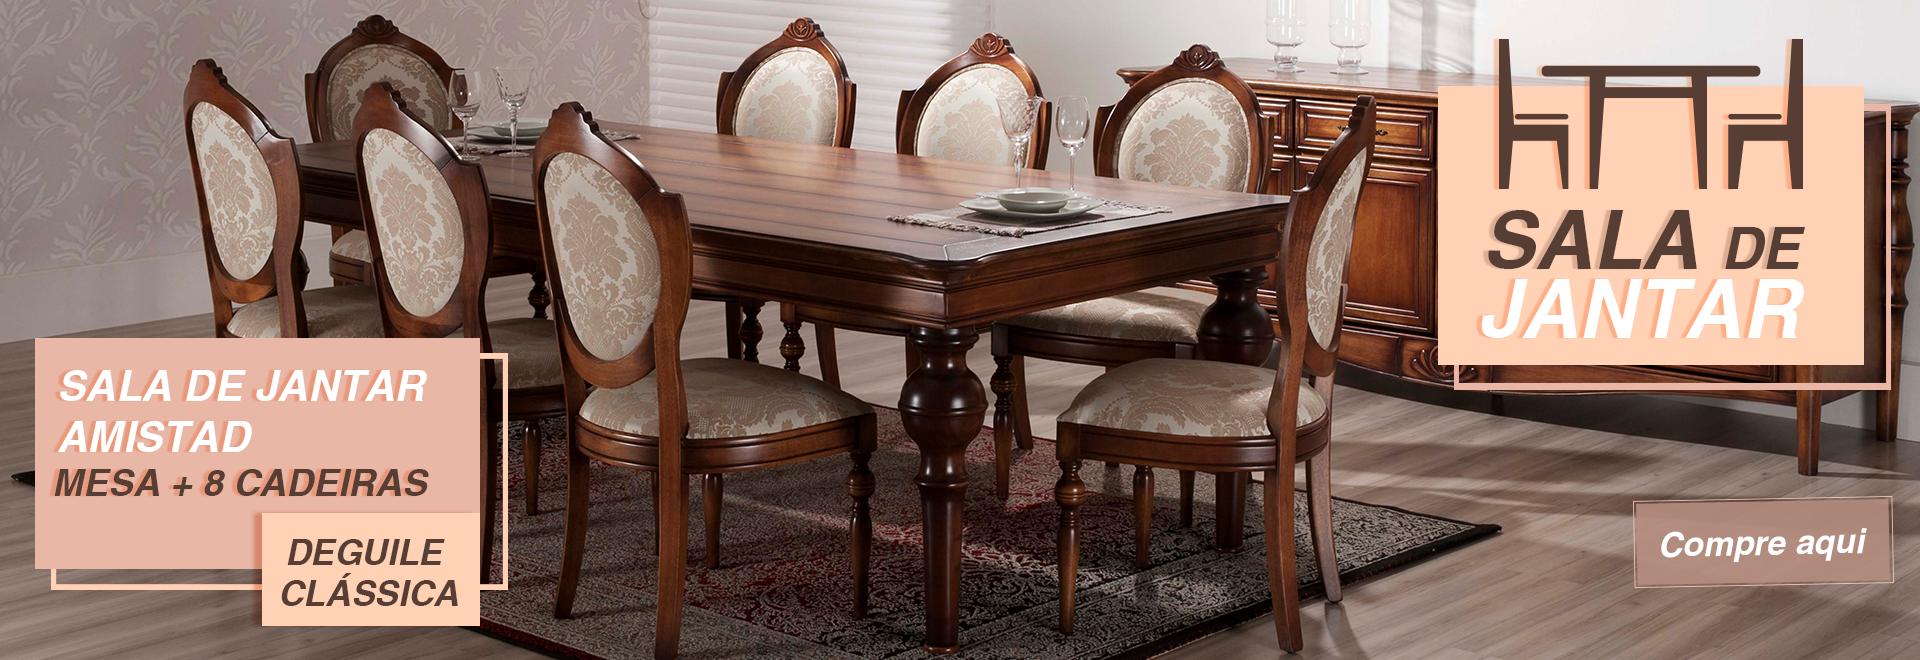 Sala de Jantar Amistad - Mesa + 8 Cadeiras - Deguile Clássica